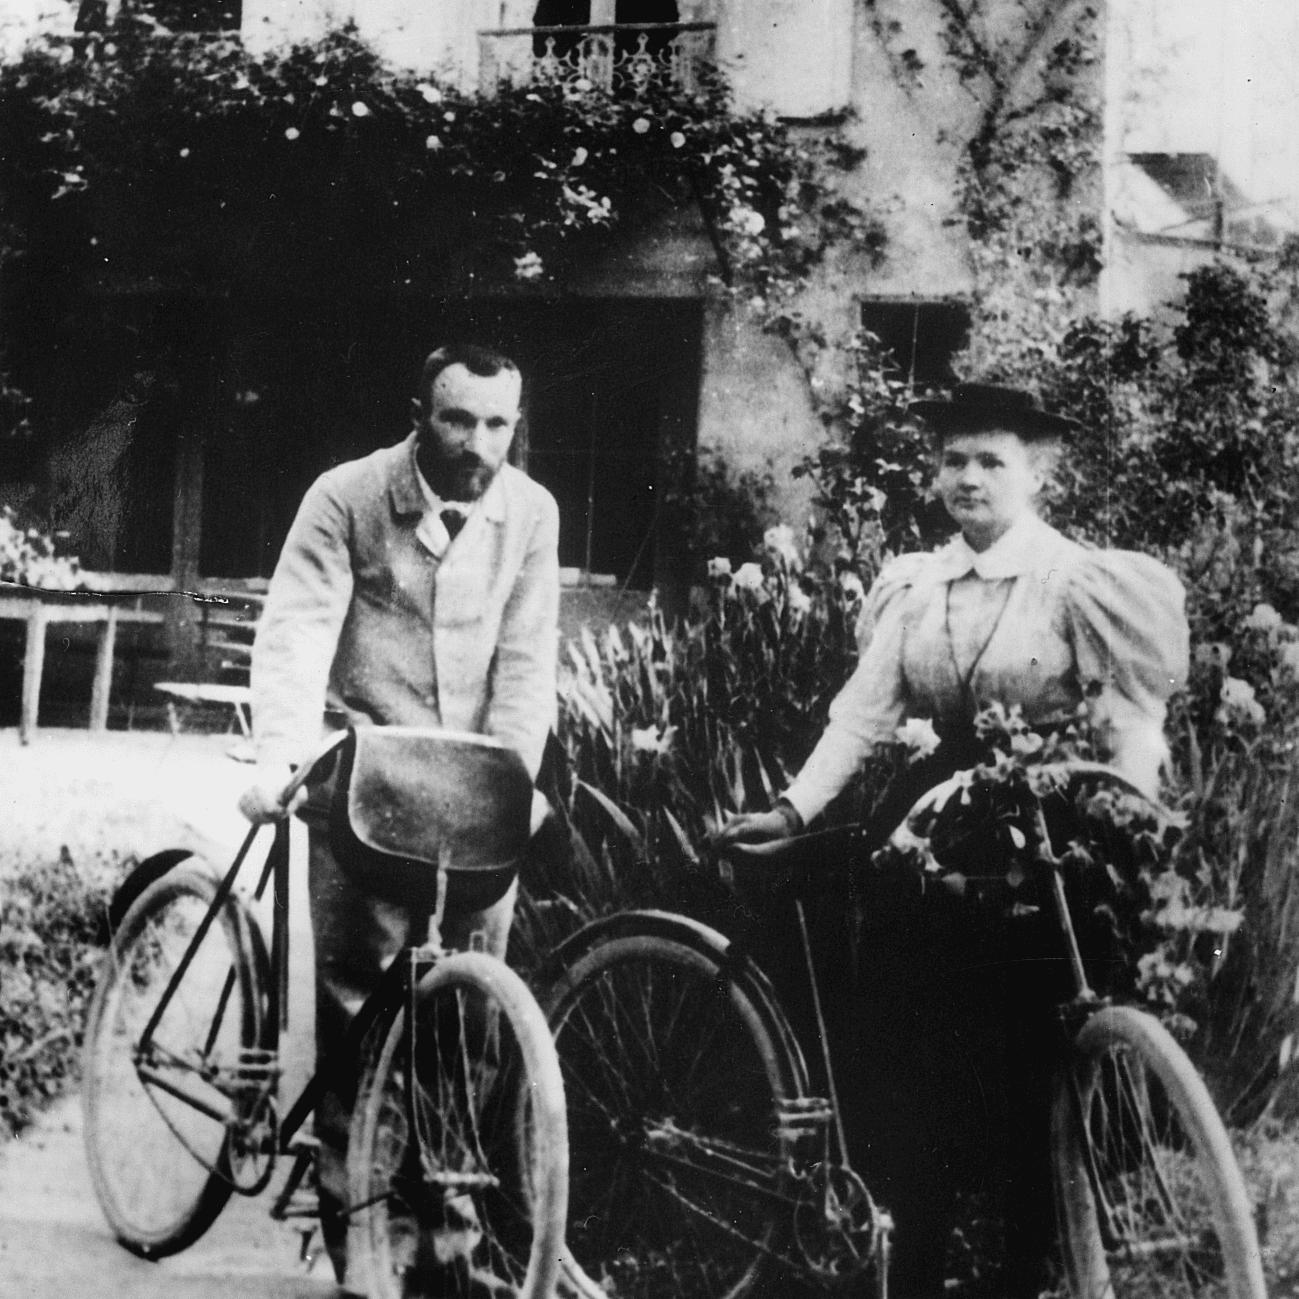 Marie and Pierre Curie Honeymoon 1895